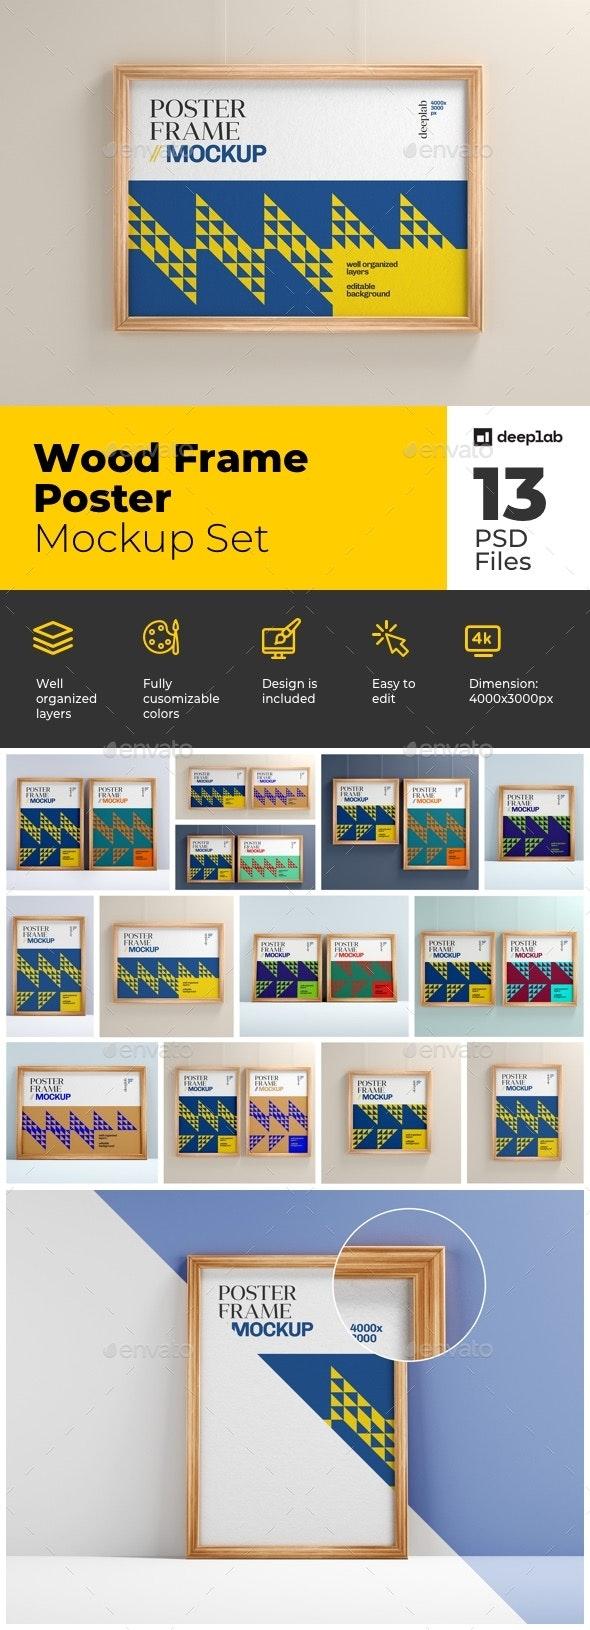 Wood Frame Poster Mockup Set - Product Mock-Ups Graphics